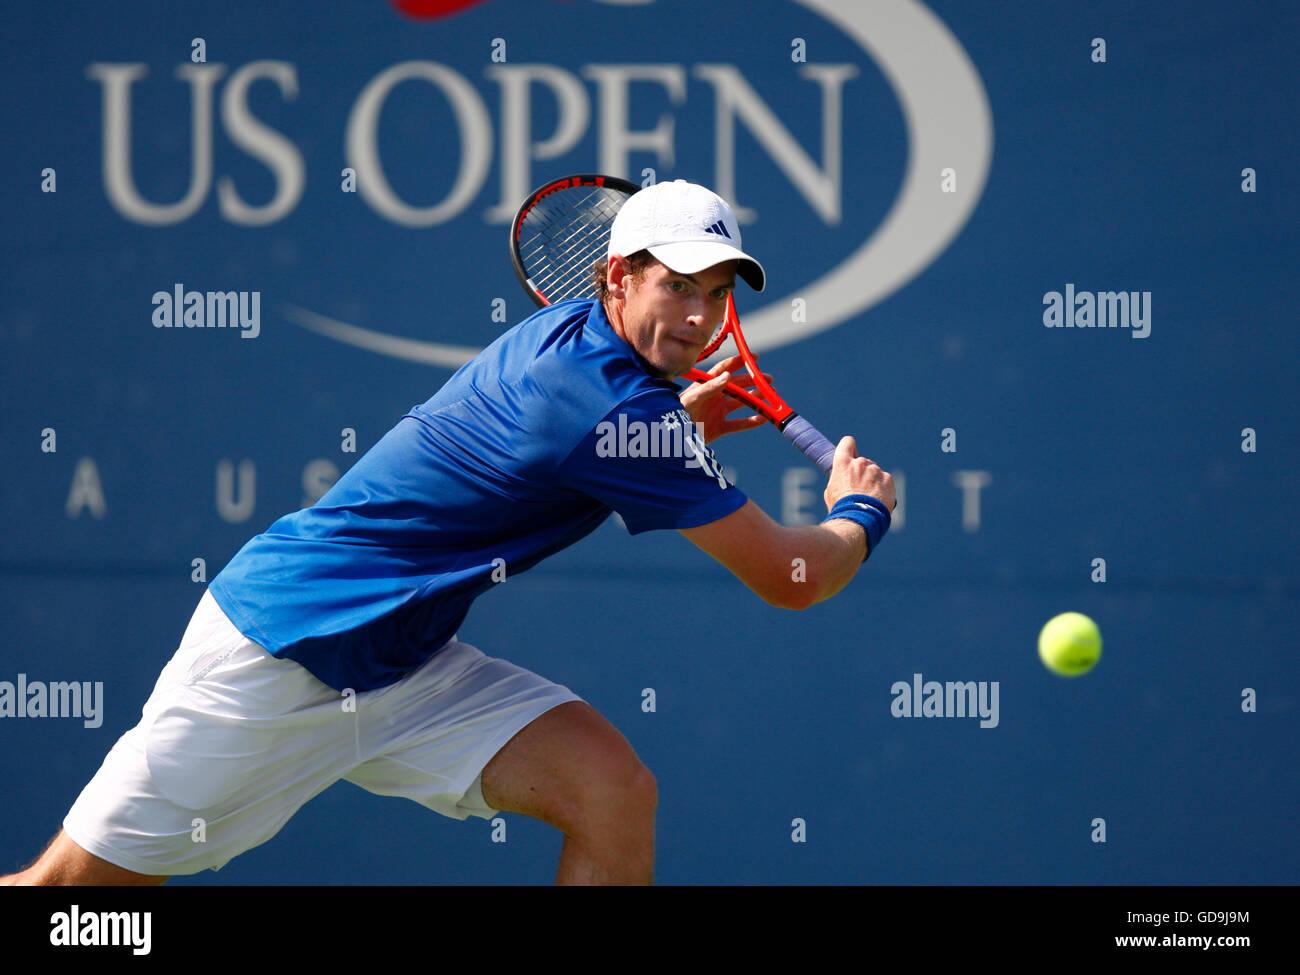 Andy Murray, British tennis player, US Open 2010, ITF Grand Slam Tennis Tournament, USTA Billie Jean King National - Stock Image